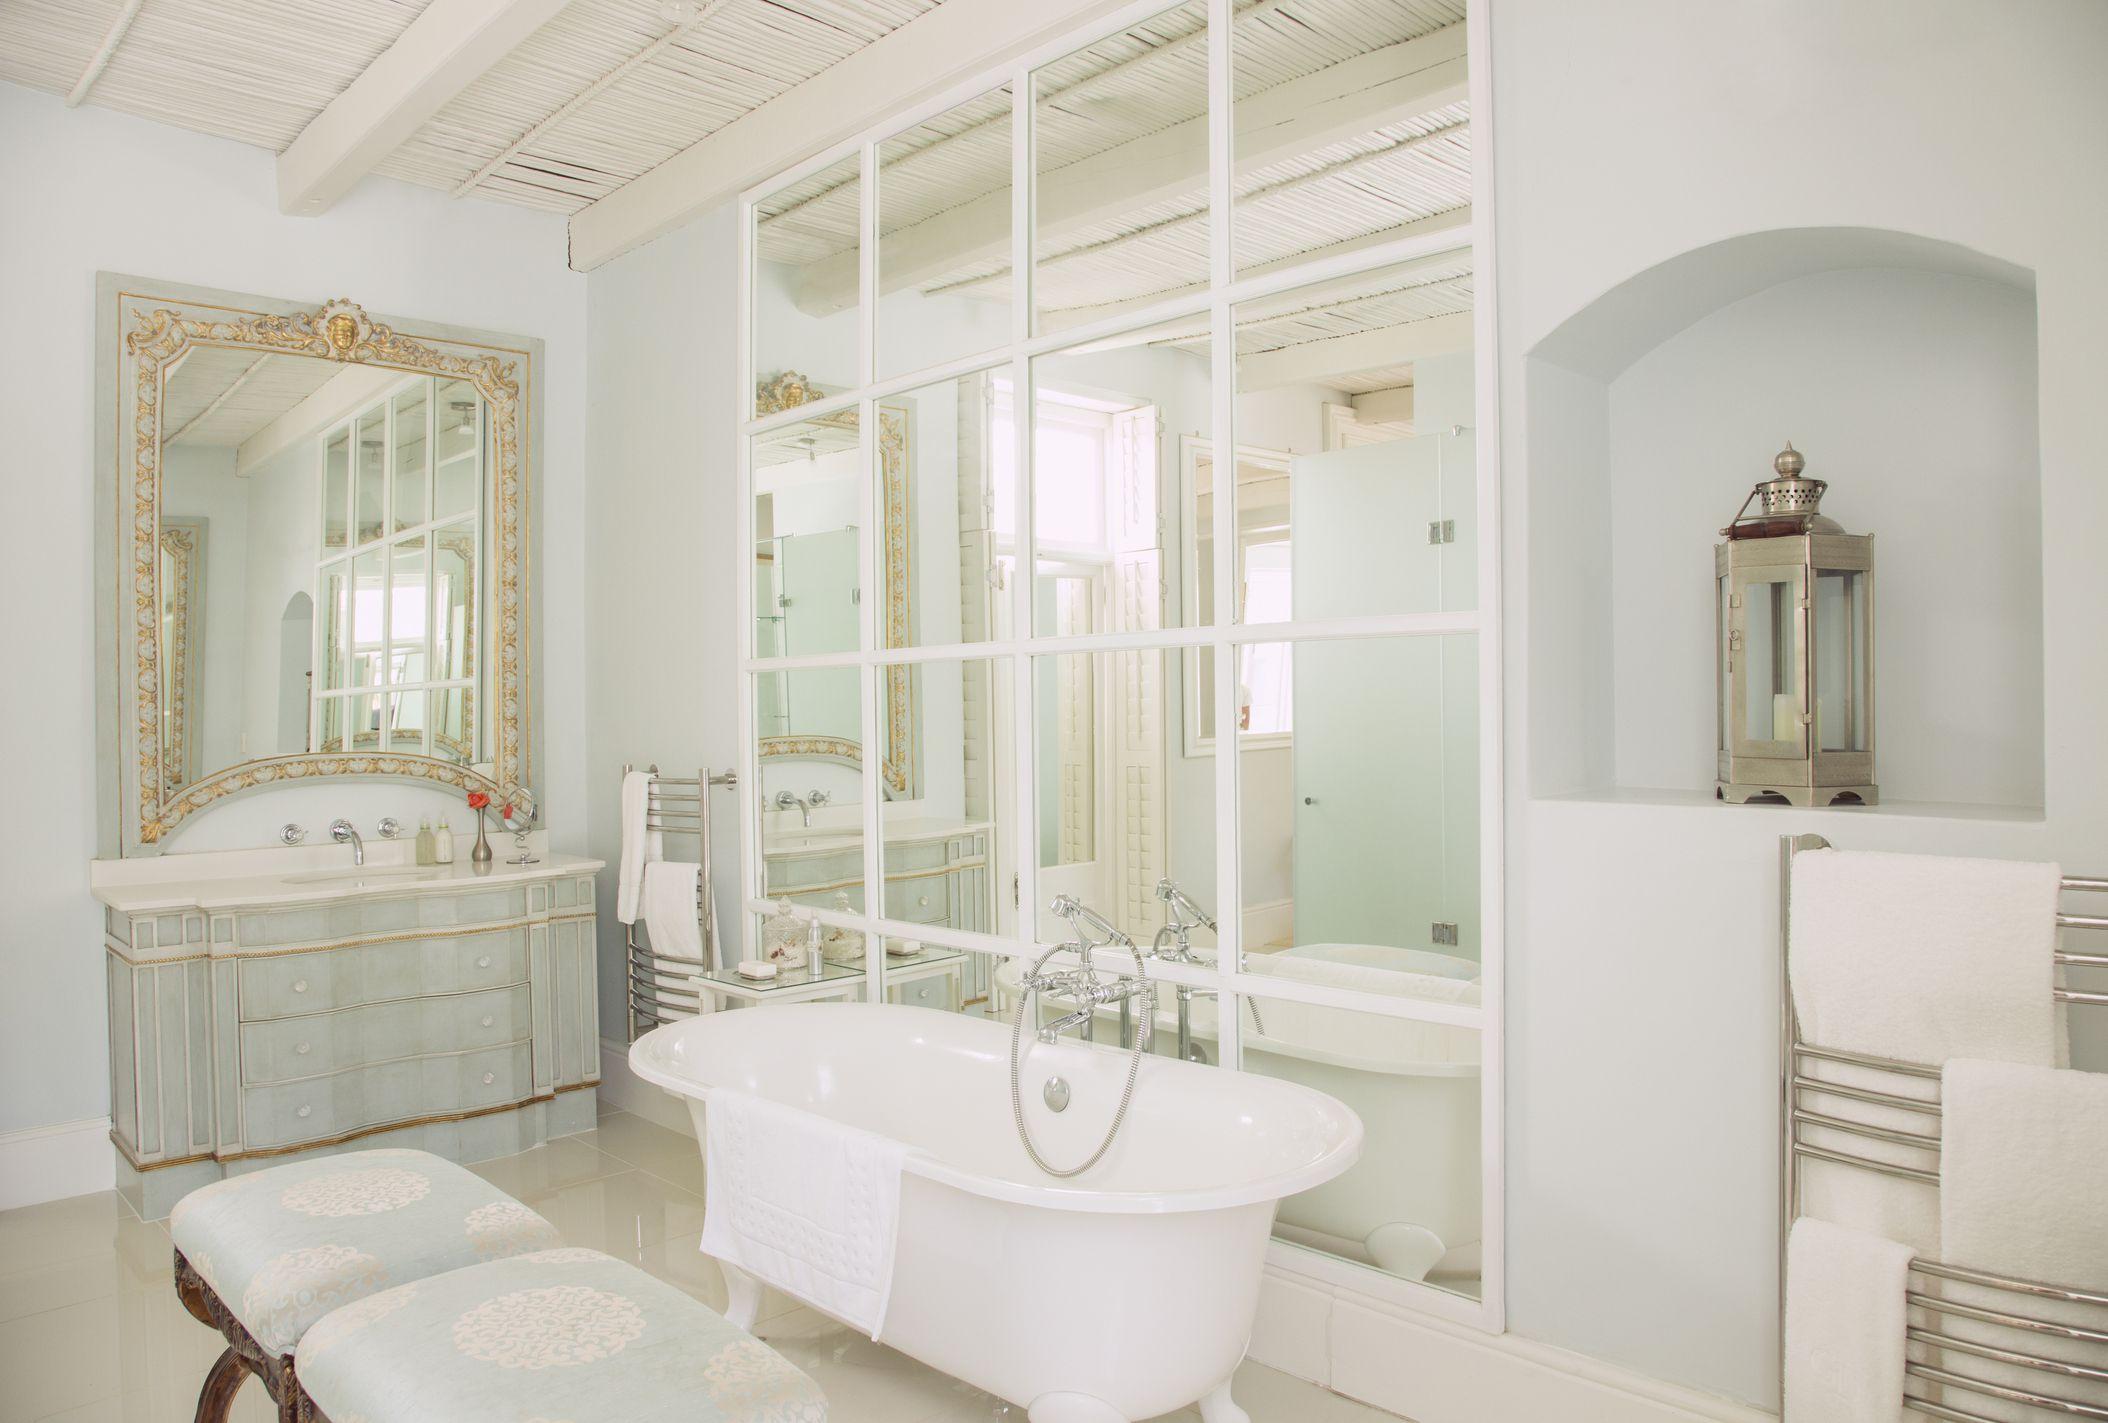 25 killer small bathroom design tips design tips for an elegant new bathroom dailygadgetfo Gallery